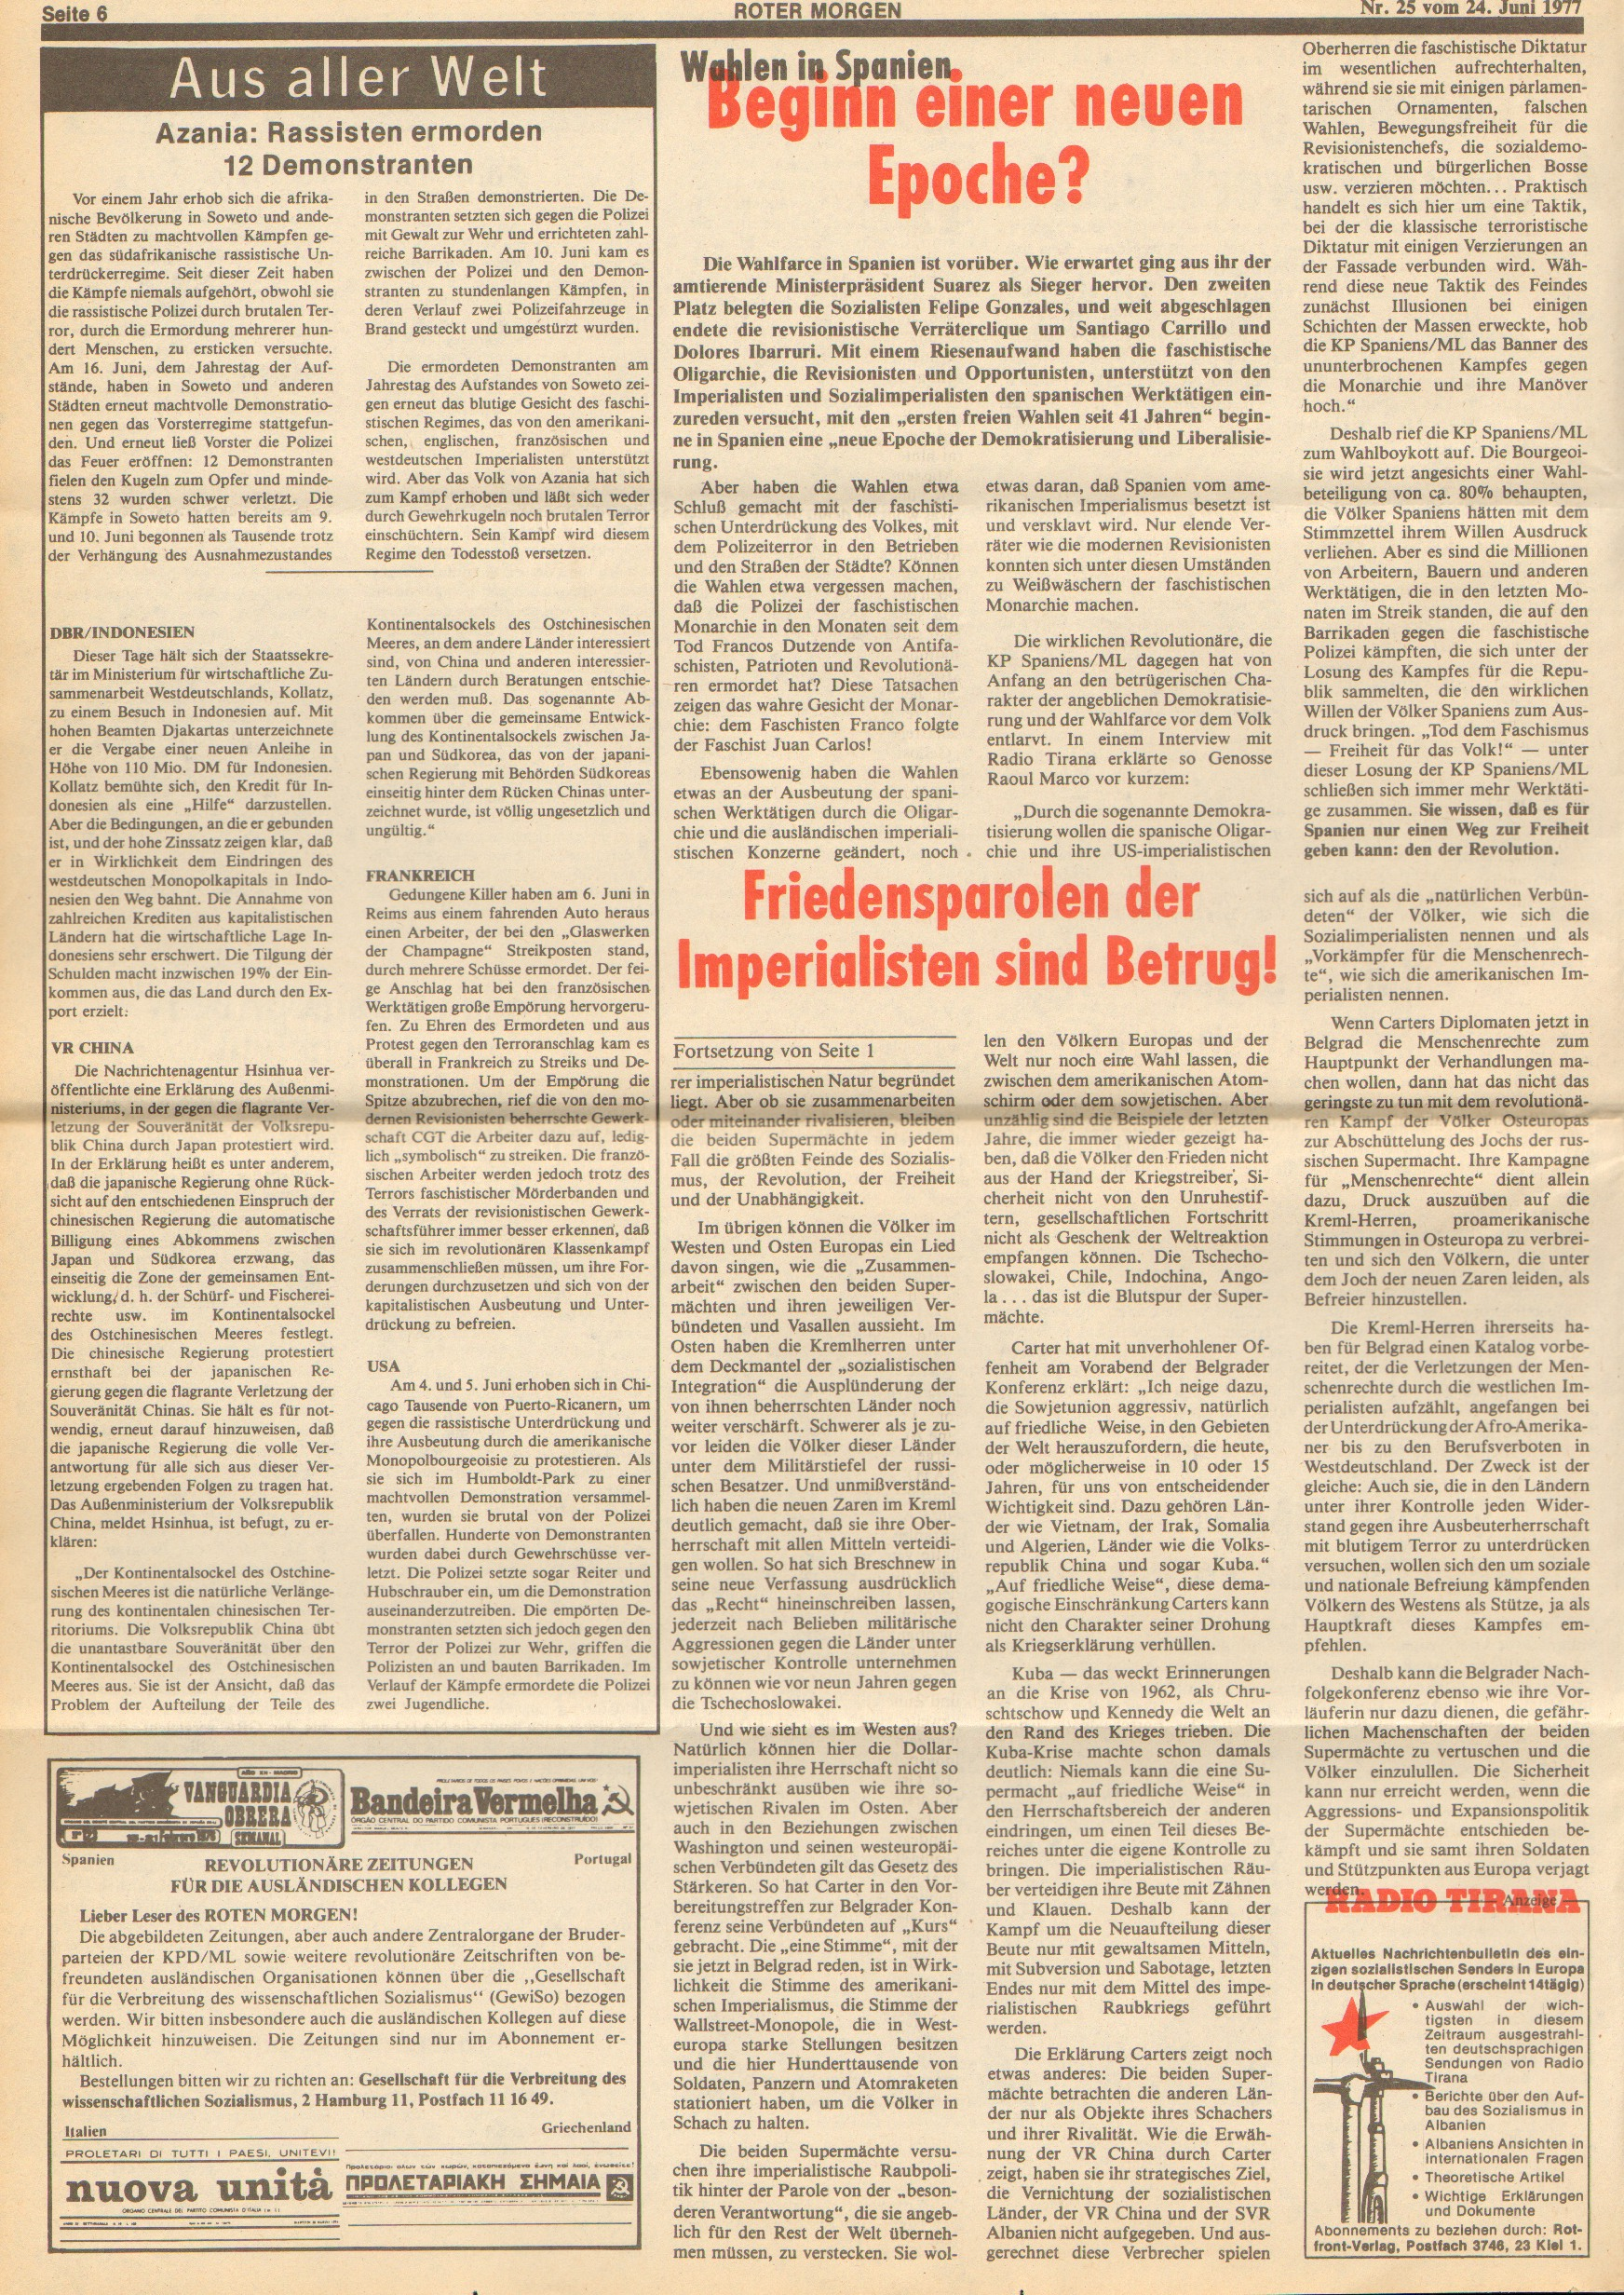 Roter Morgen, 11. Jg., 24. Juni 1977, Nr. 25, Seite 6